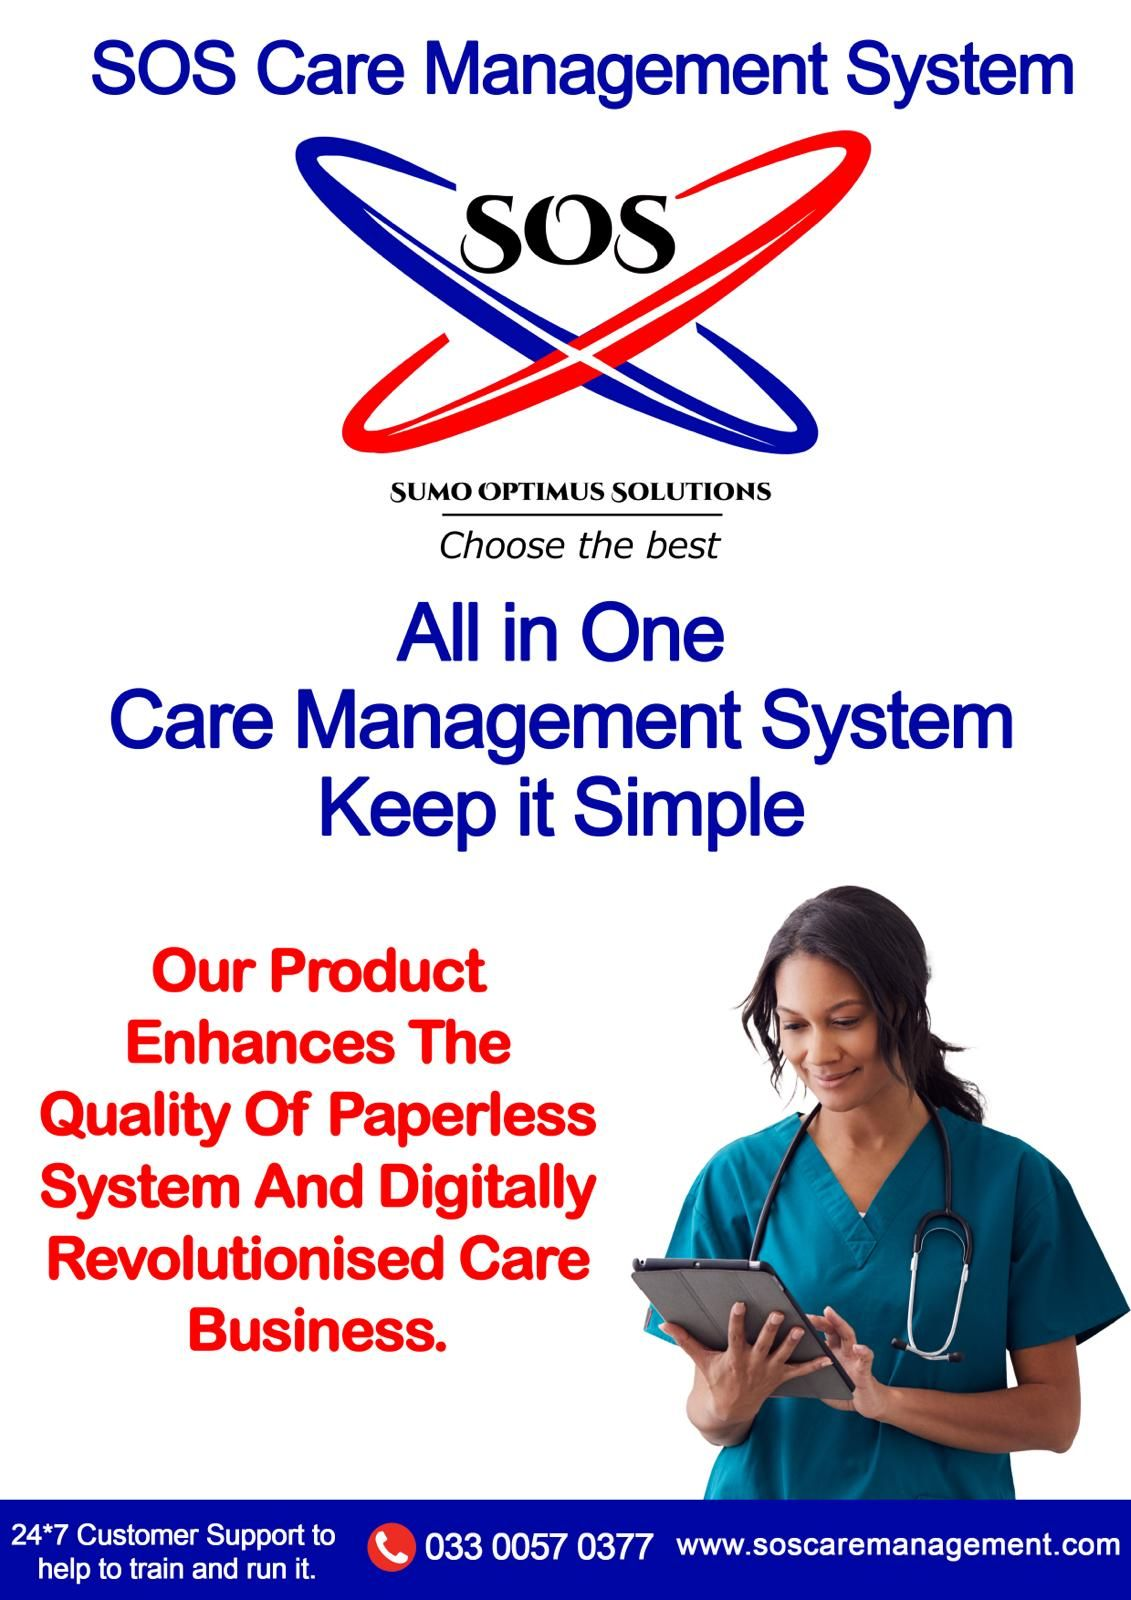 SOS Care Management